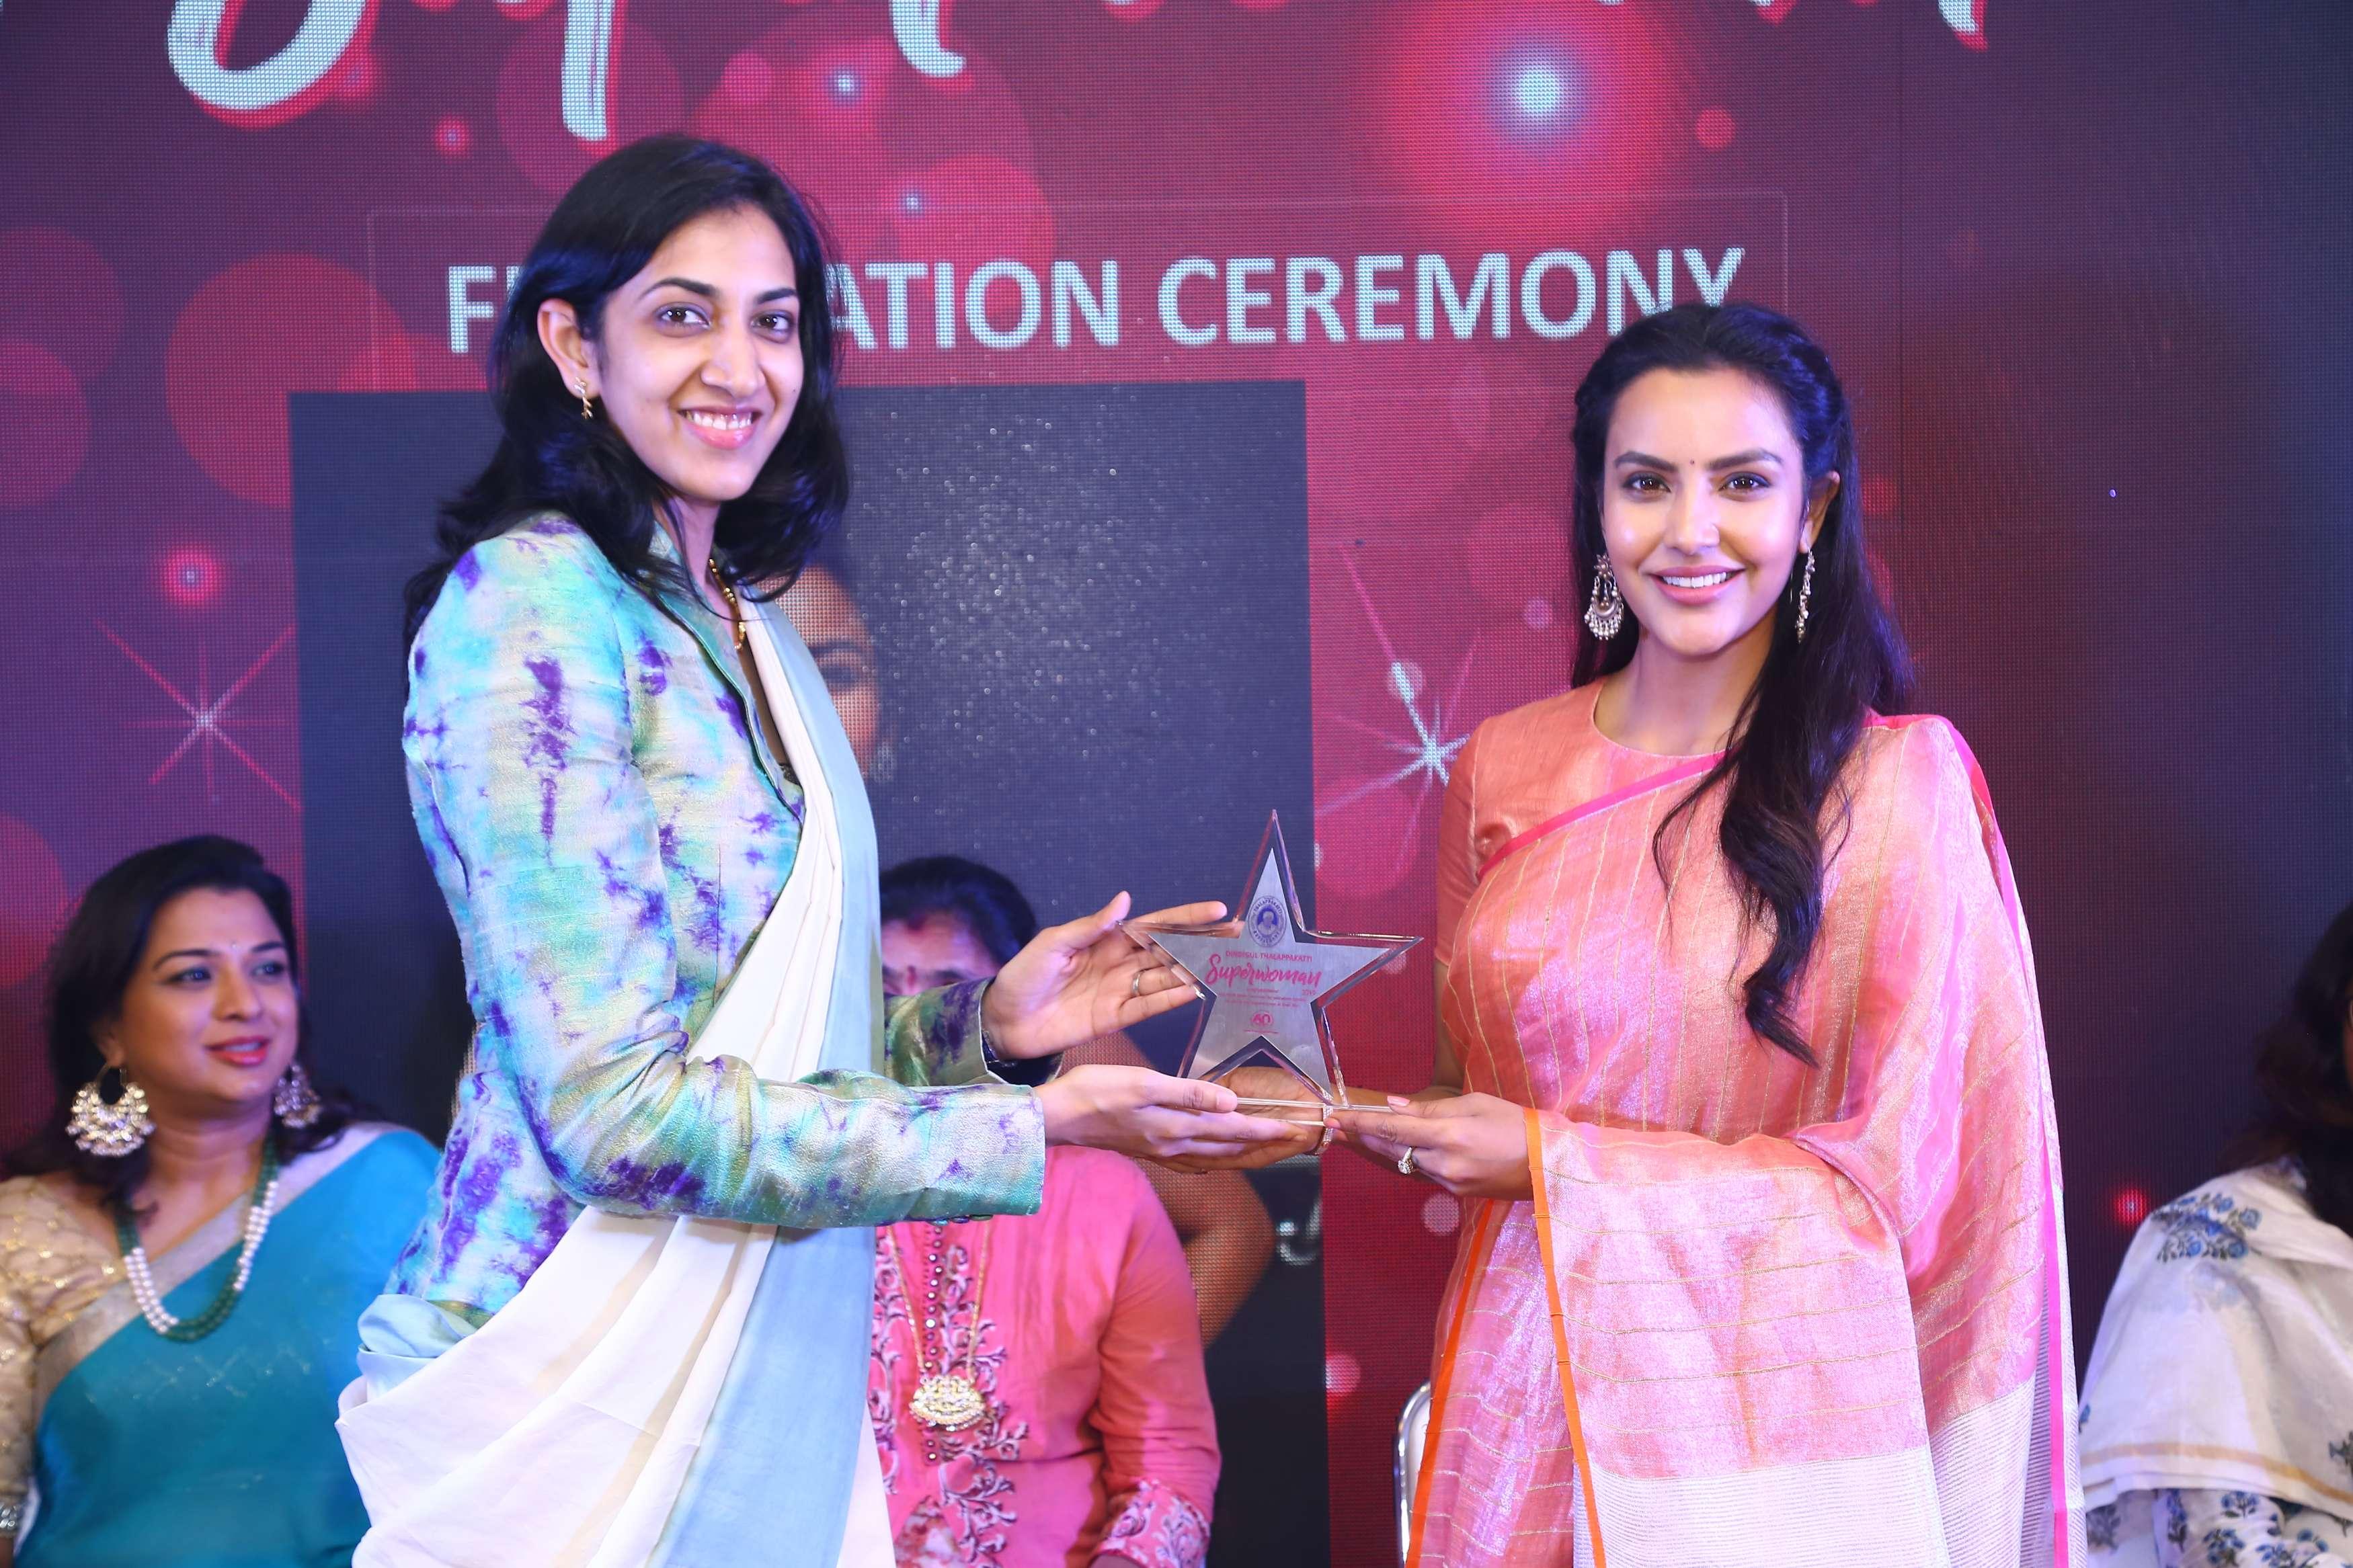 Dindigul Thalappakatti honoring Superwoman Felicitation to Priya Anand